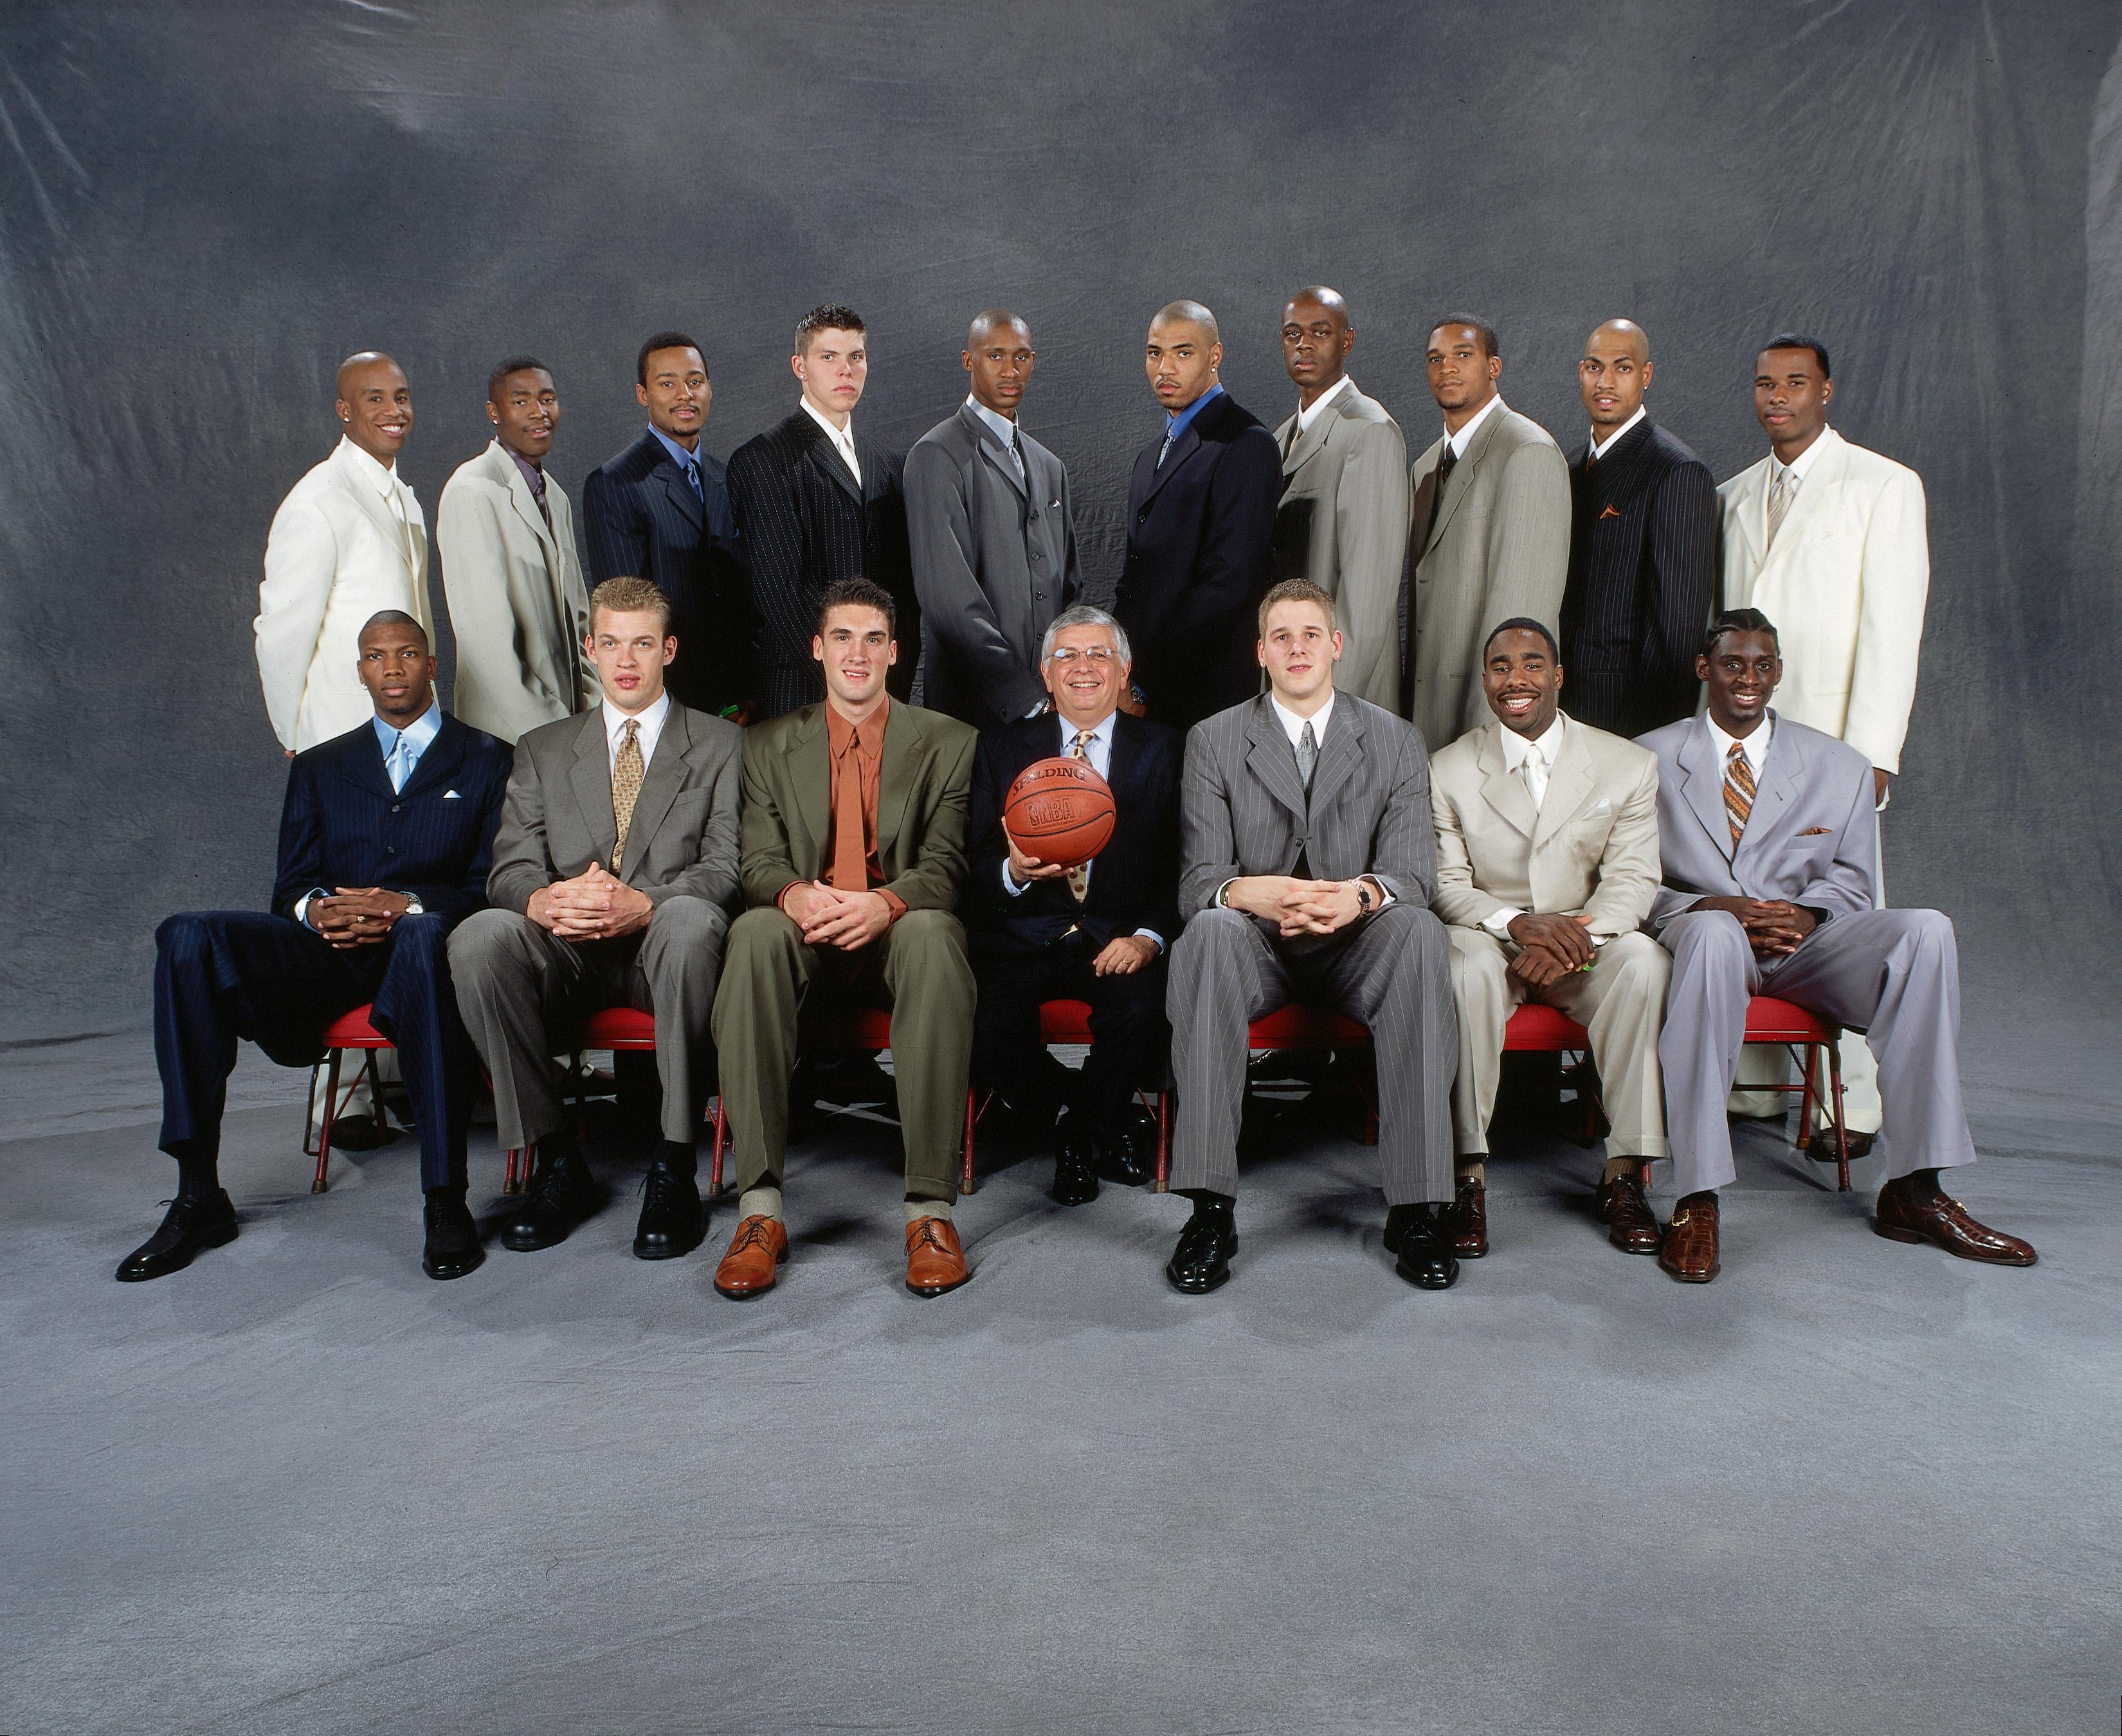 2000 NBA Draft